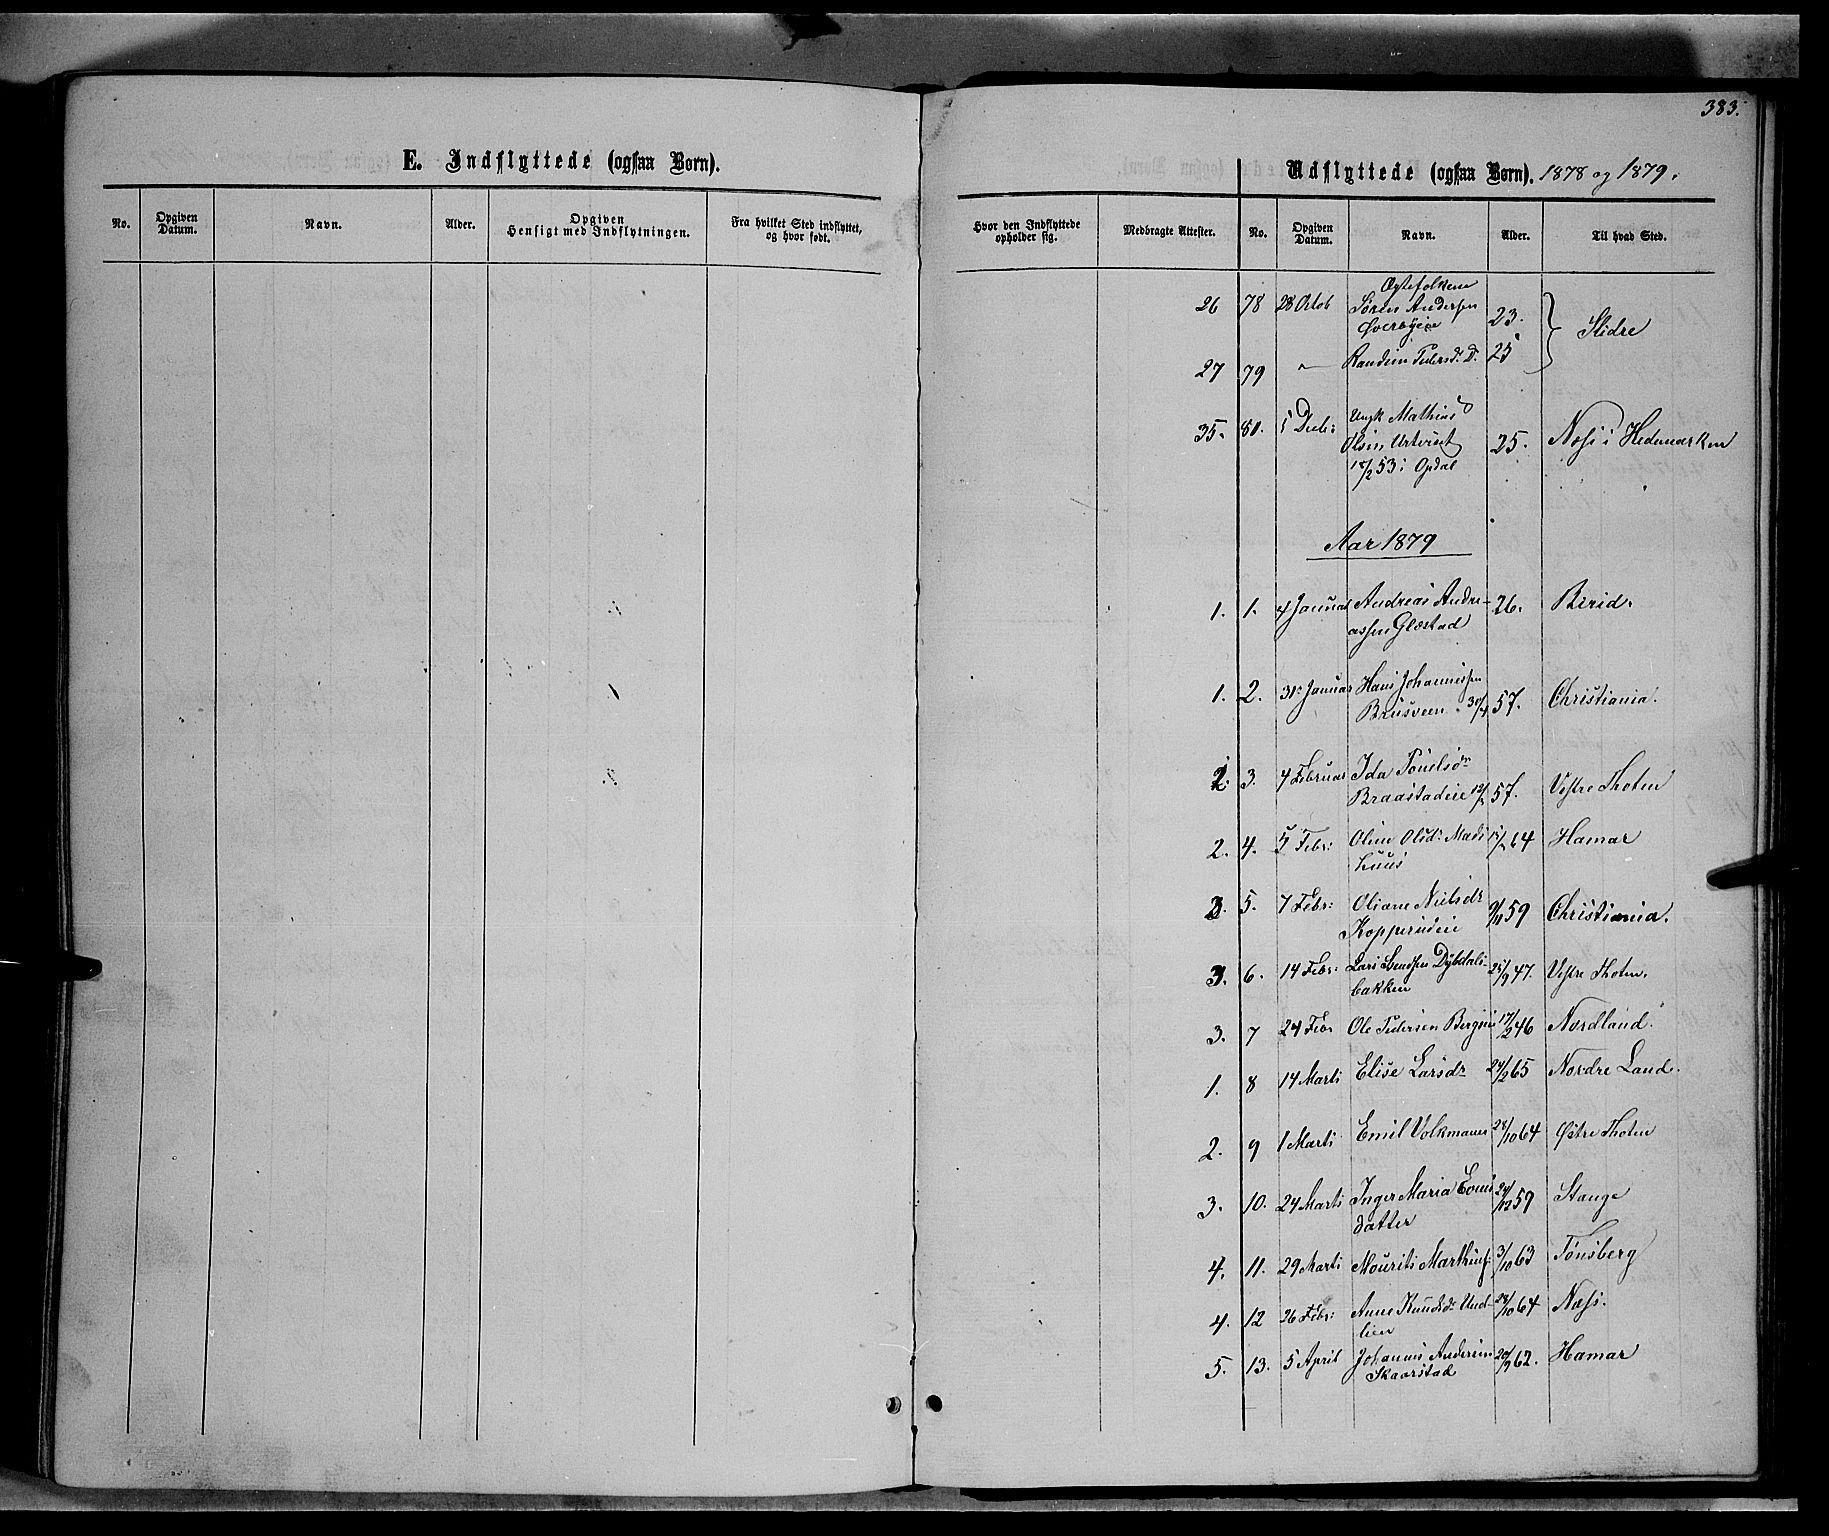 SAH, Vardal prestekontor, H/Ha/Hab/L0006: Klokkerbok nr. 6, 1869-1881, s. 383